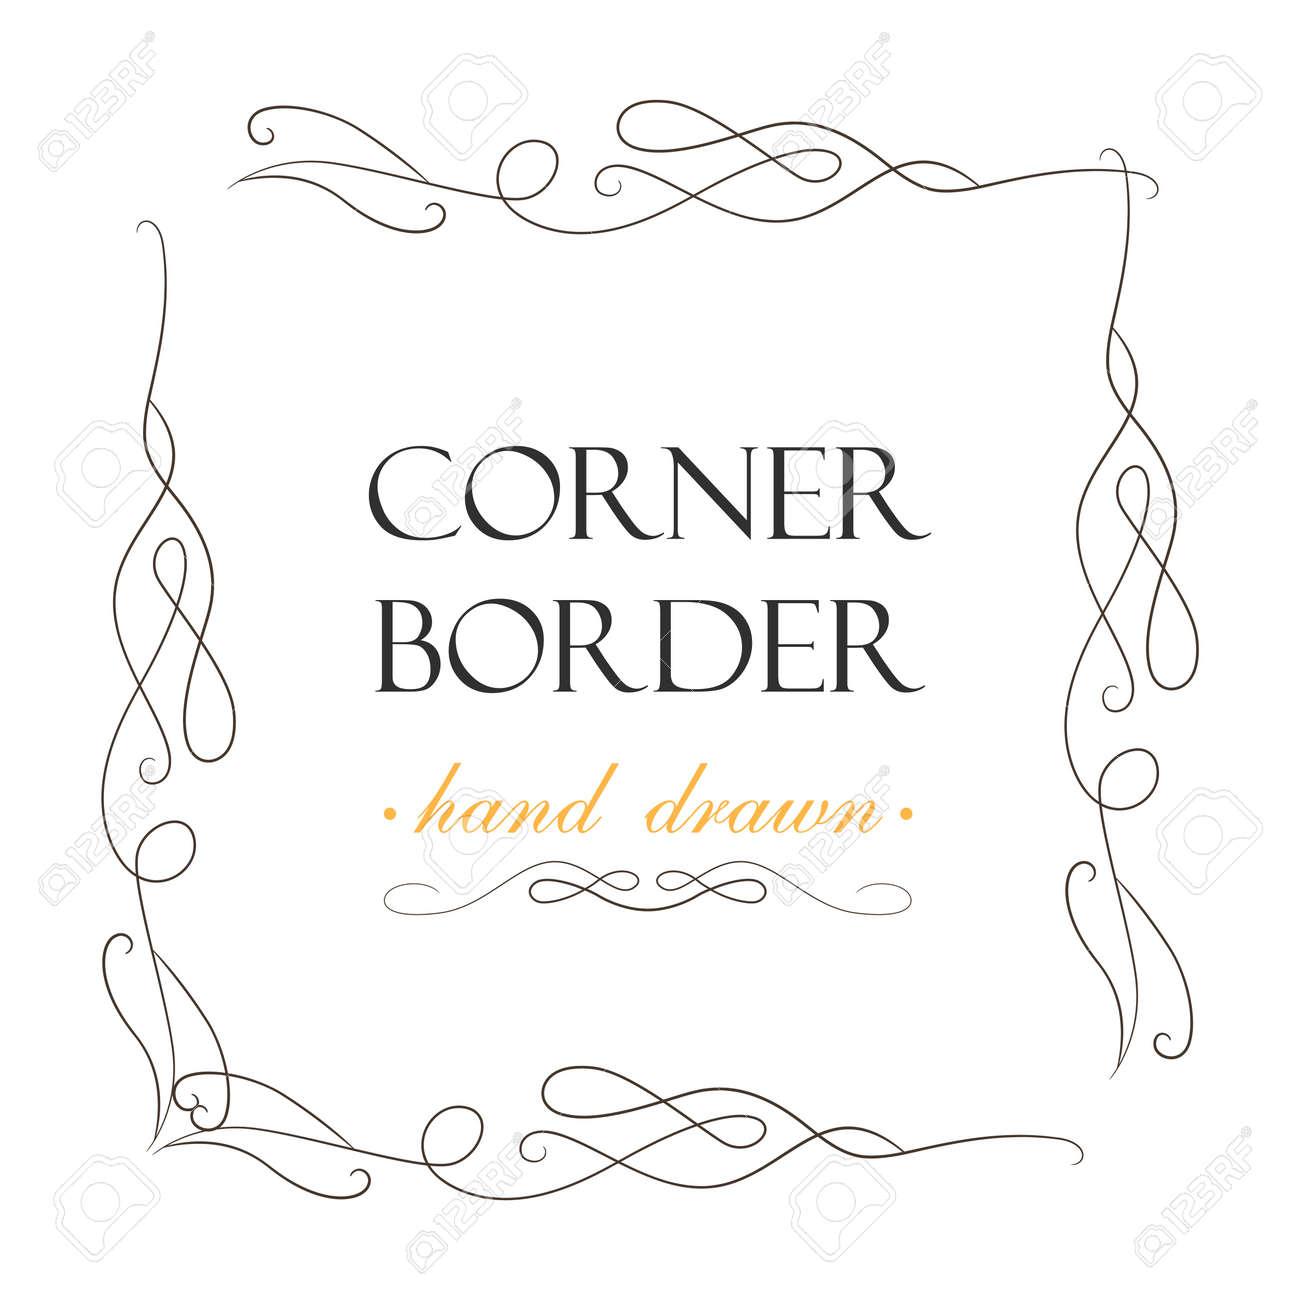 Designer Vintage Corner Border Set Wedding Invitation Card Decoration Calligraphy Elegant Decorative Swirls Ornate Delicate Cute Art